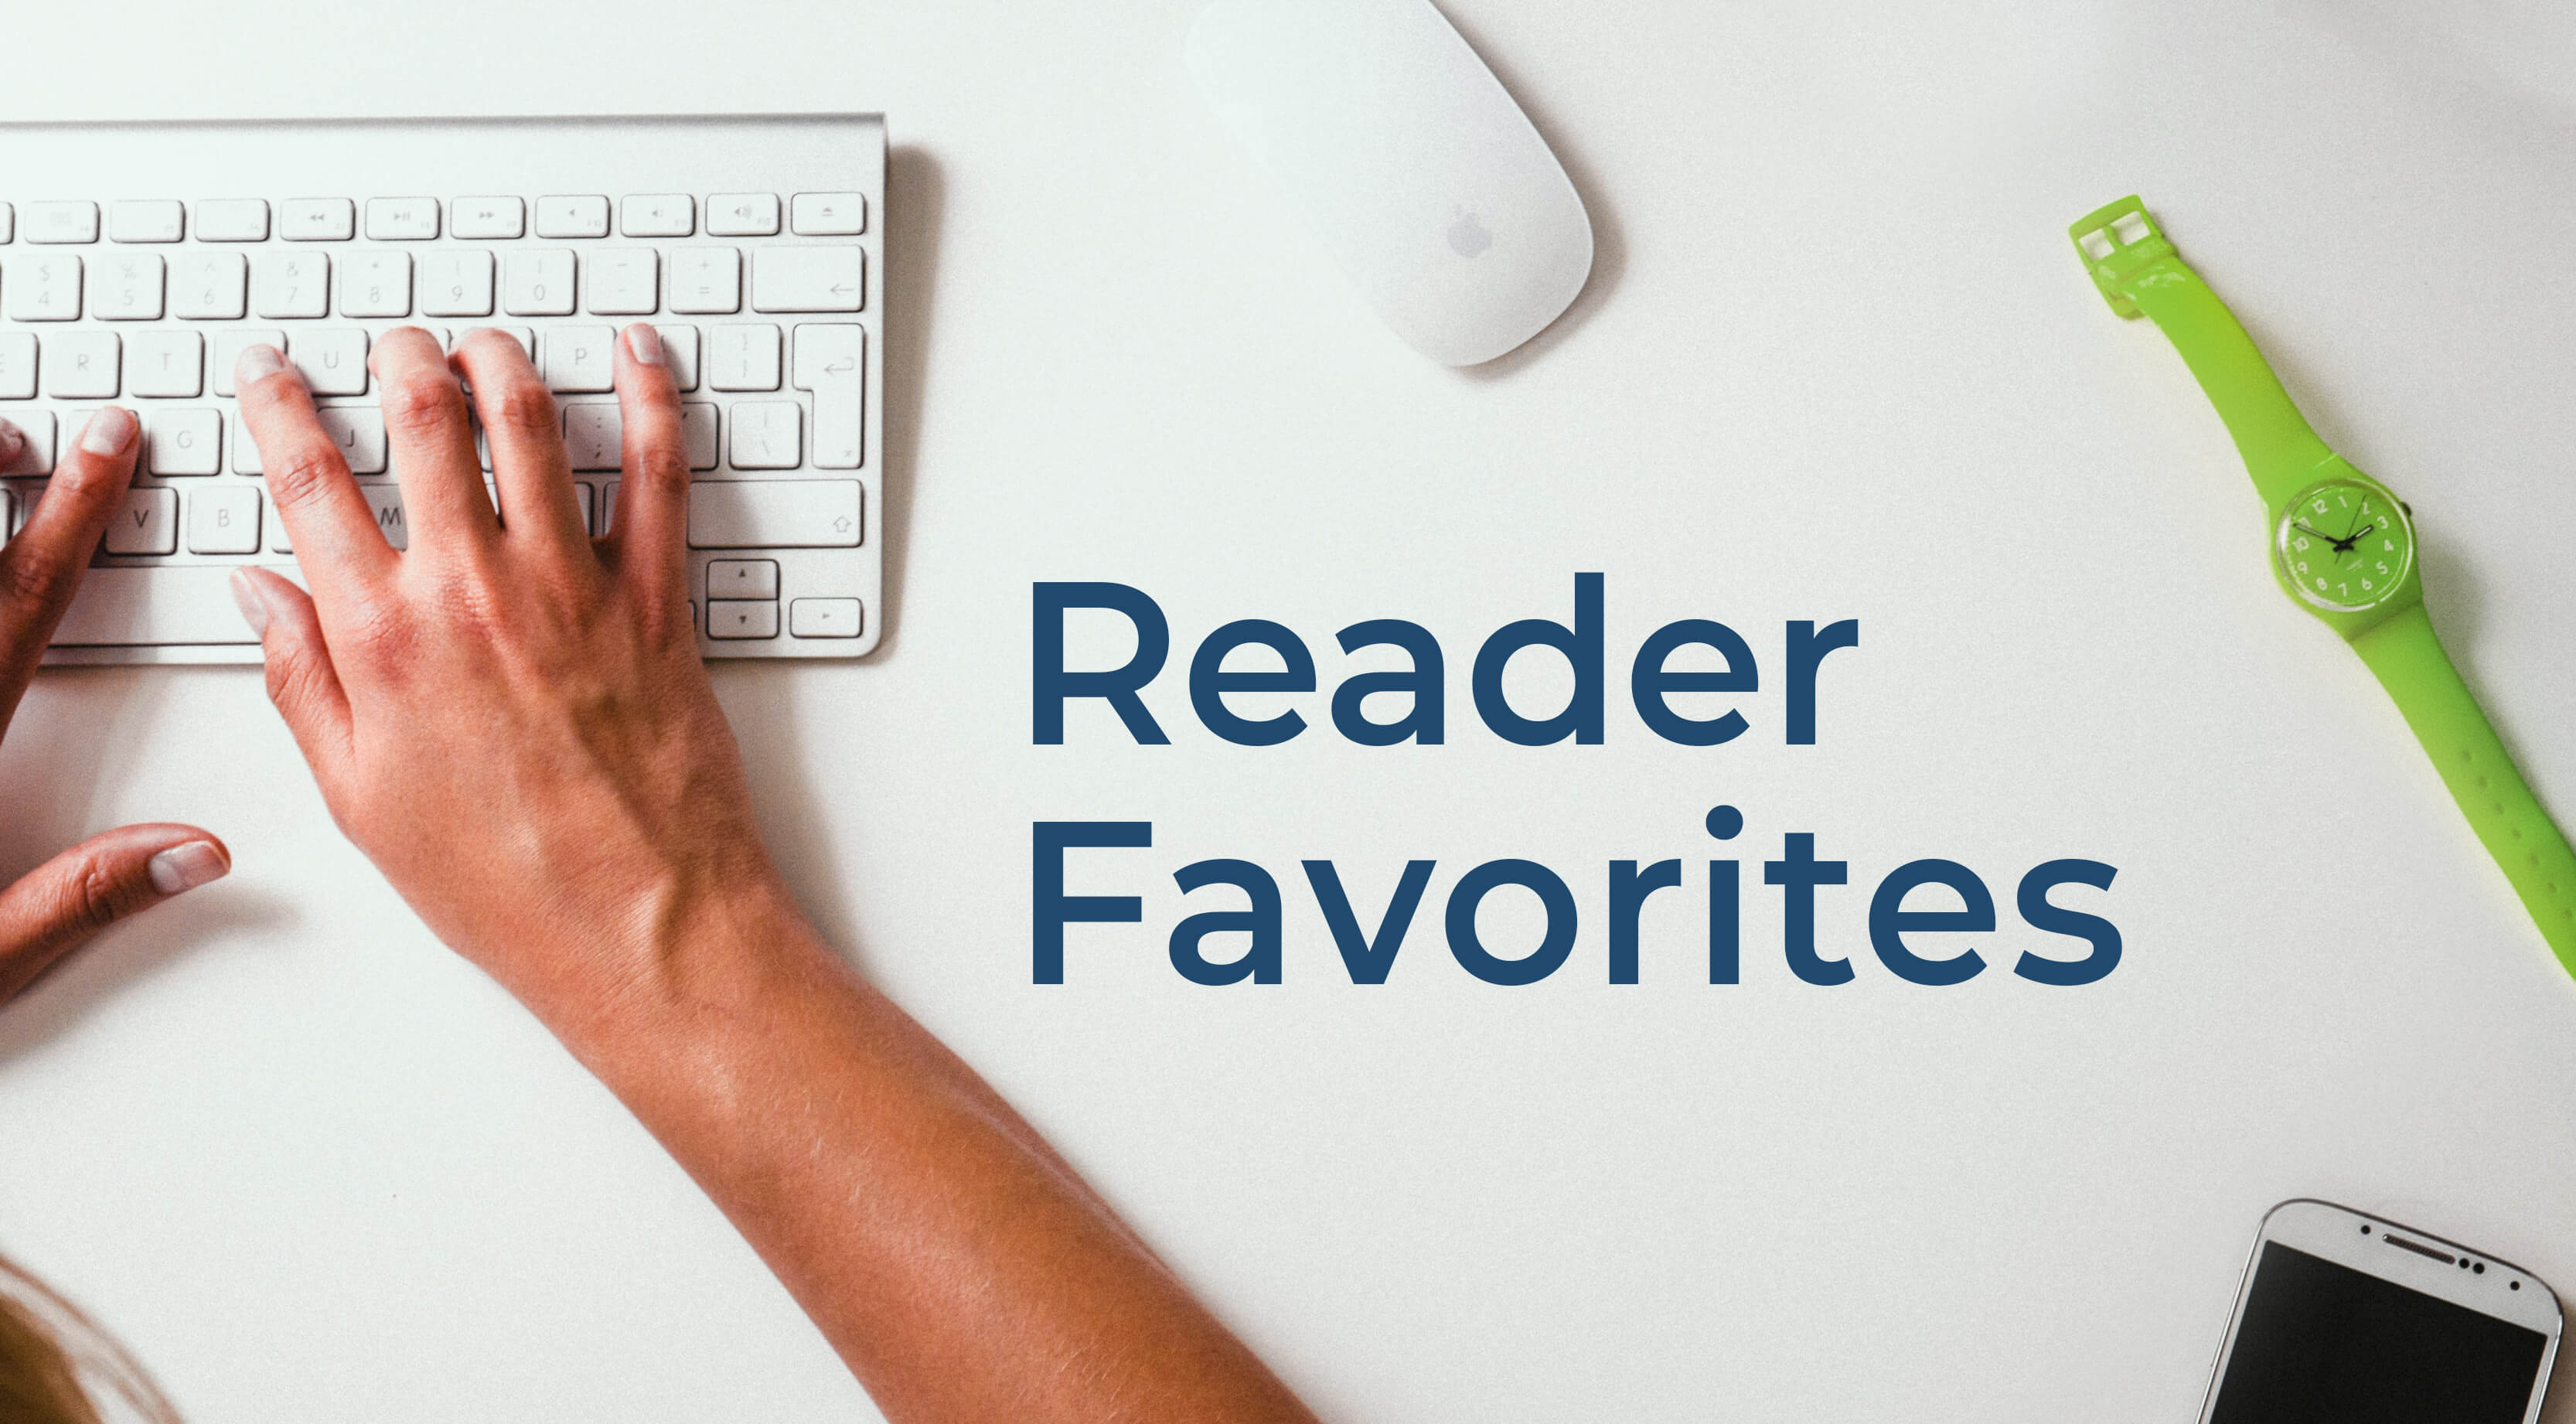 ReaderFavorites5